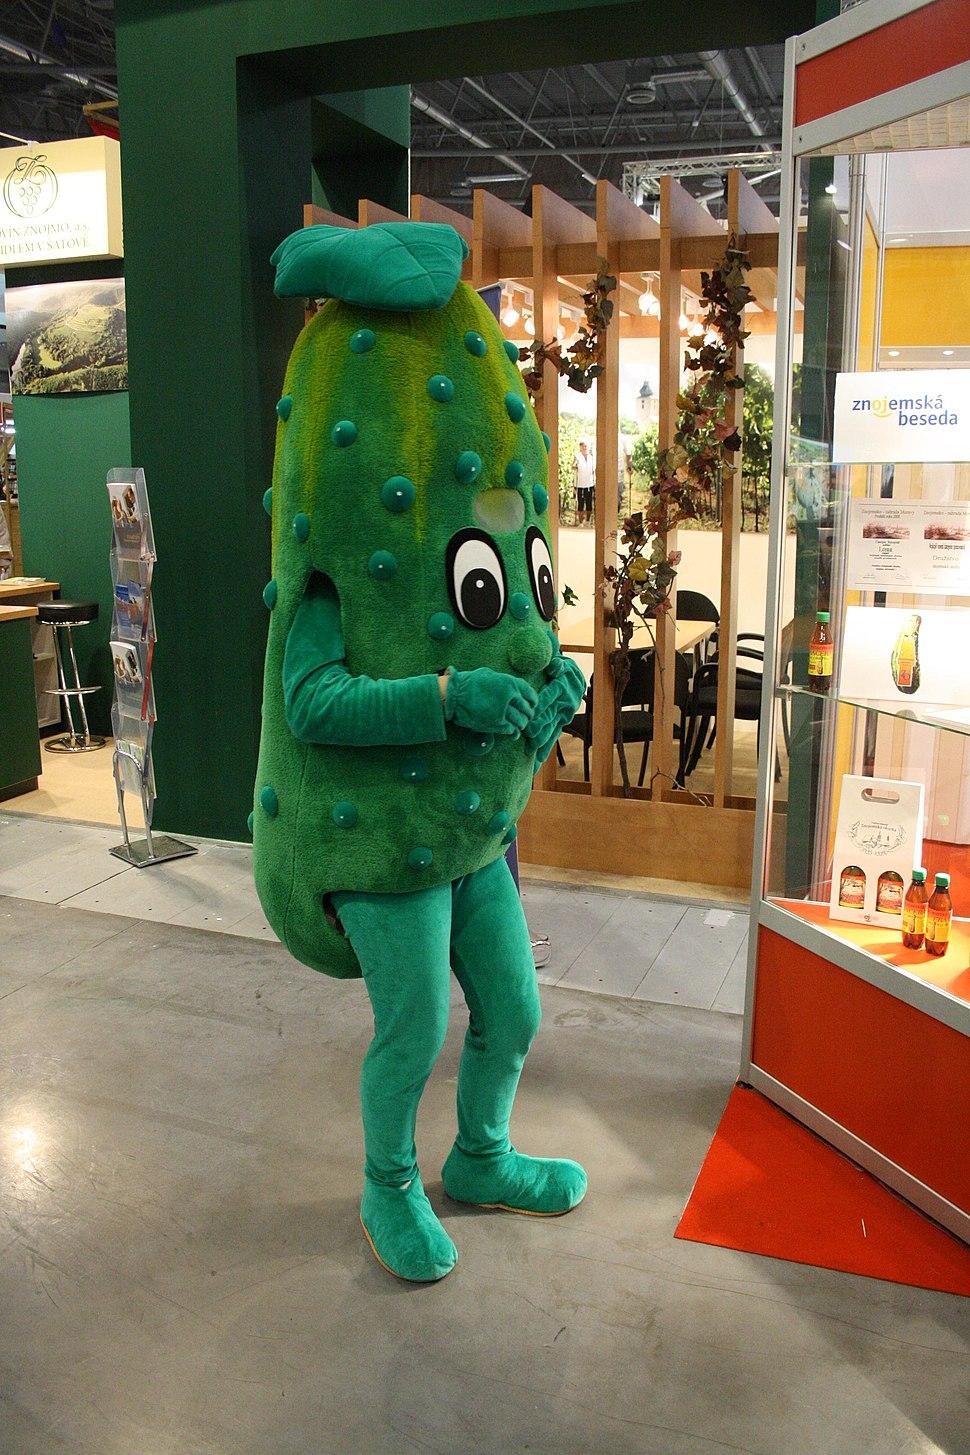 Mascot of Znojmo - cucumber at Regiontour 2010